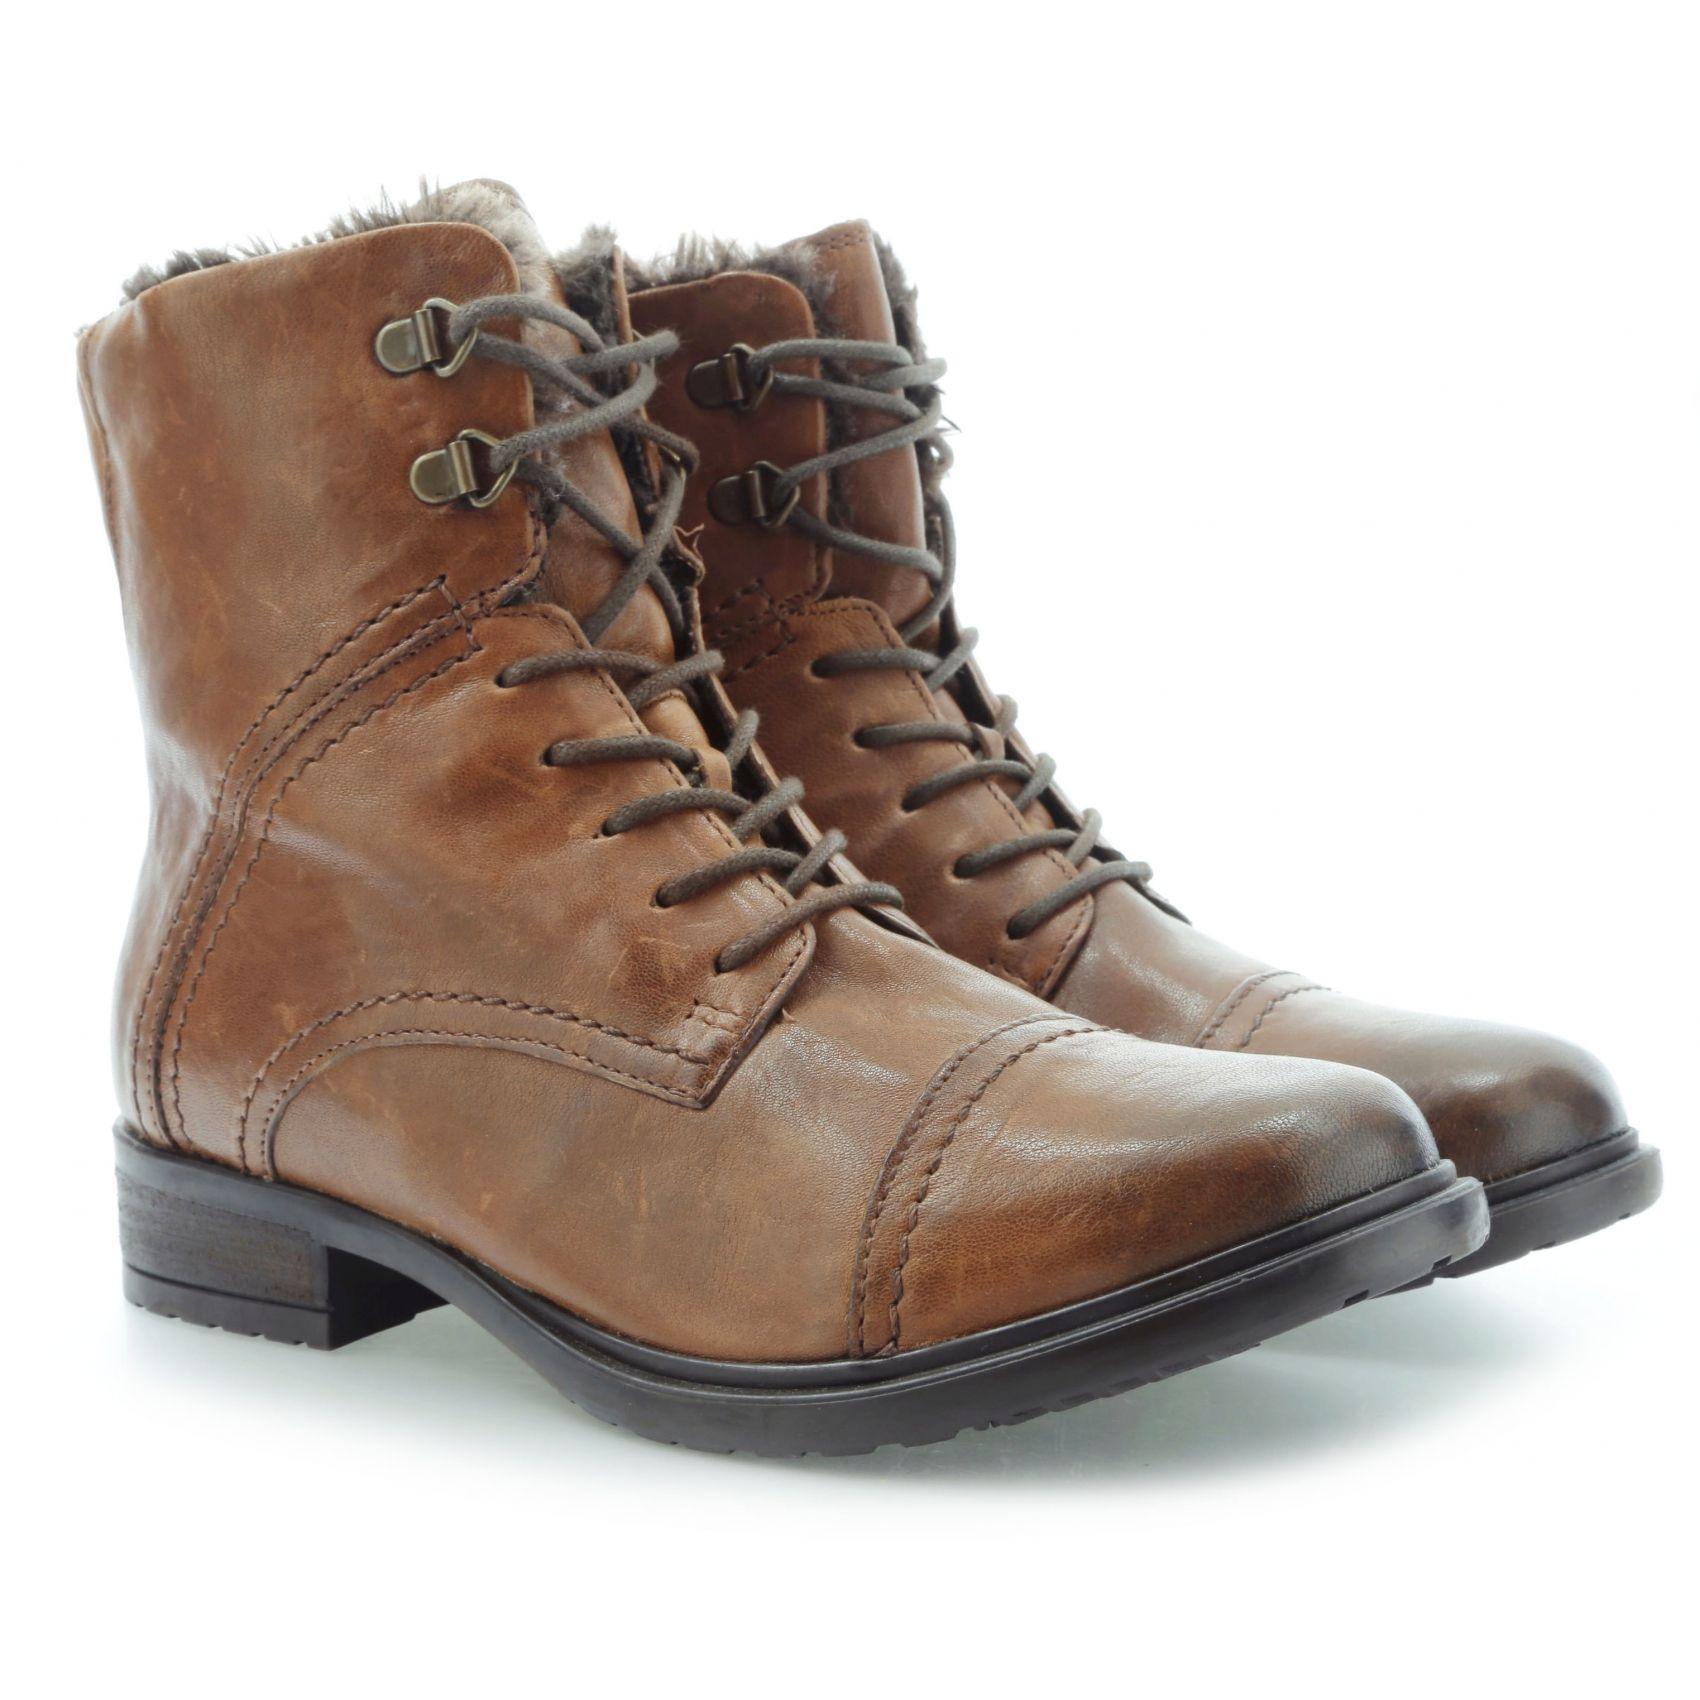 CLARKS MORTIMER LIZ TAN LEATHER 20351948 4D | Combat boots | Women shoes in  RiccardoFashion.